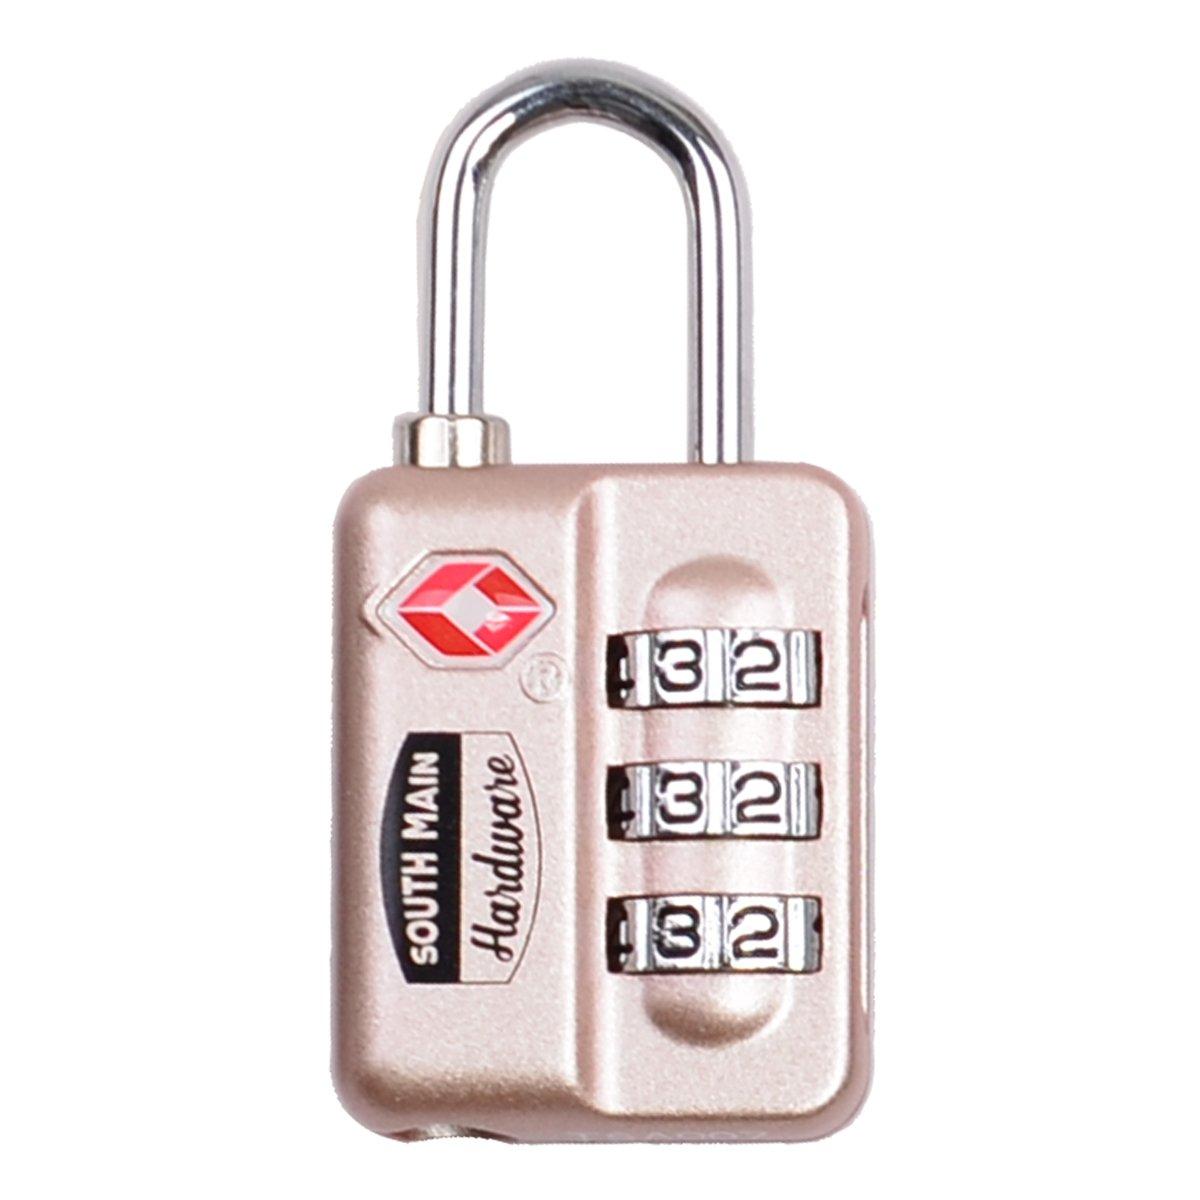 South Main Hardware TSA-Accepted Resettable Luggage Lock, Black HaoPingAn 810104